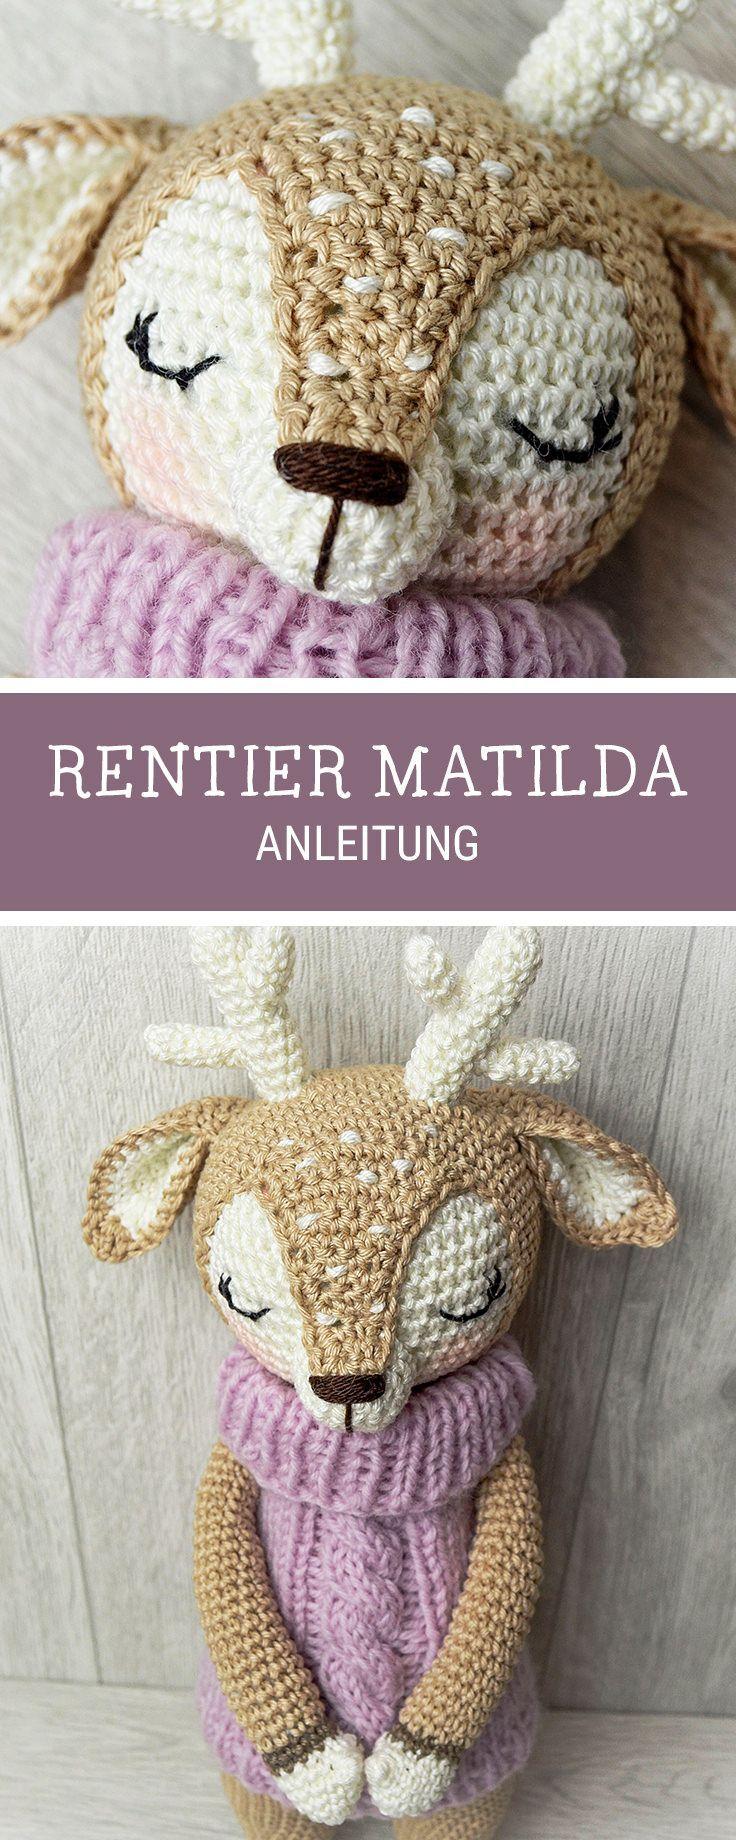 PDF Download für das Amigurumi Rentier Matilda, #häkelanleitung / crochet tutorial and pattern for a cute amigurumi reindeer, #crocheting made by Wolltastisch via DaWanda.com